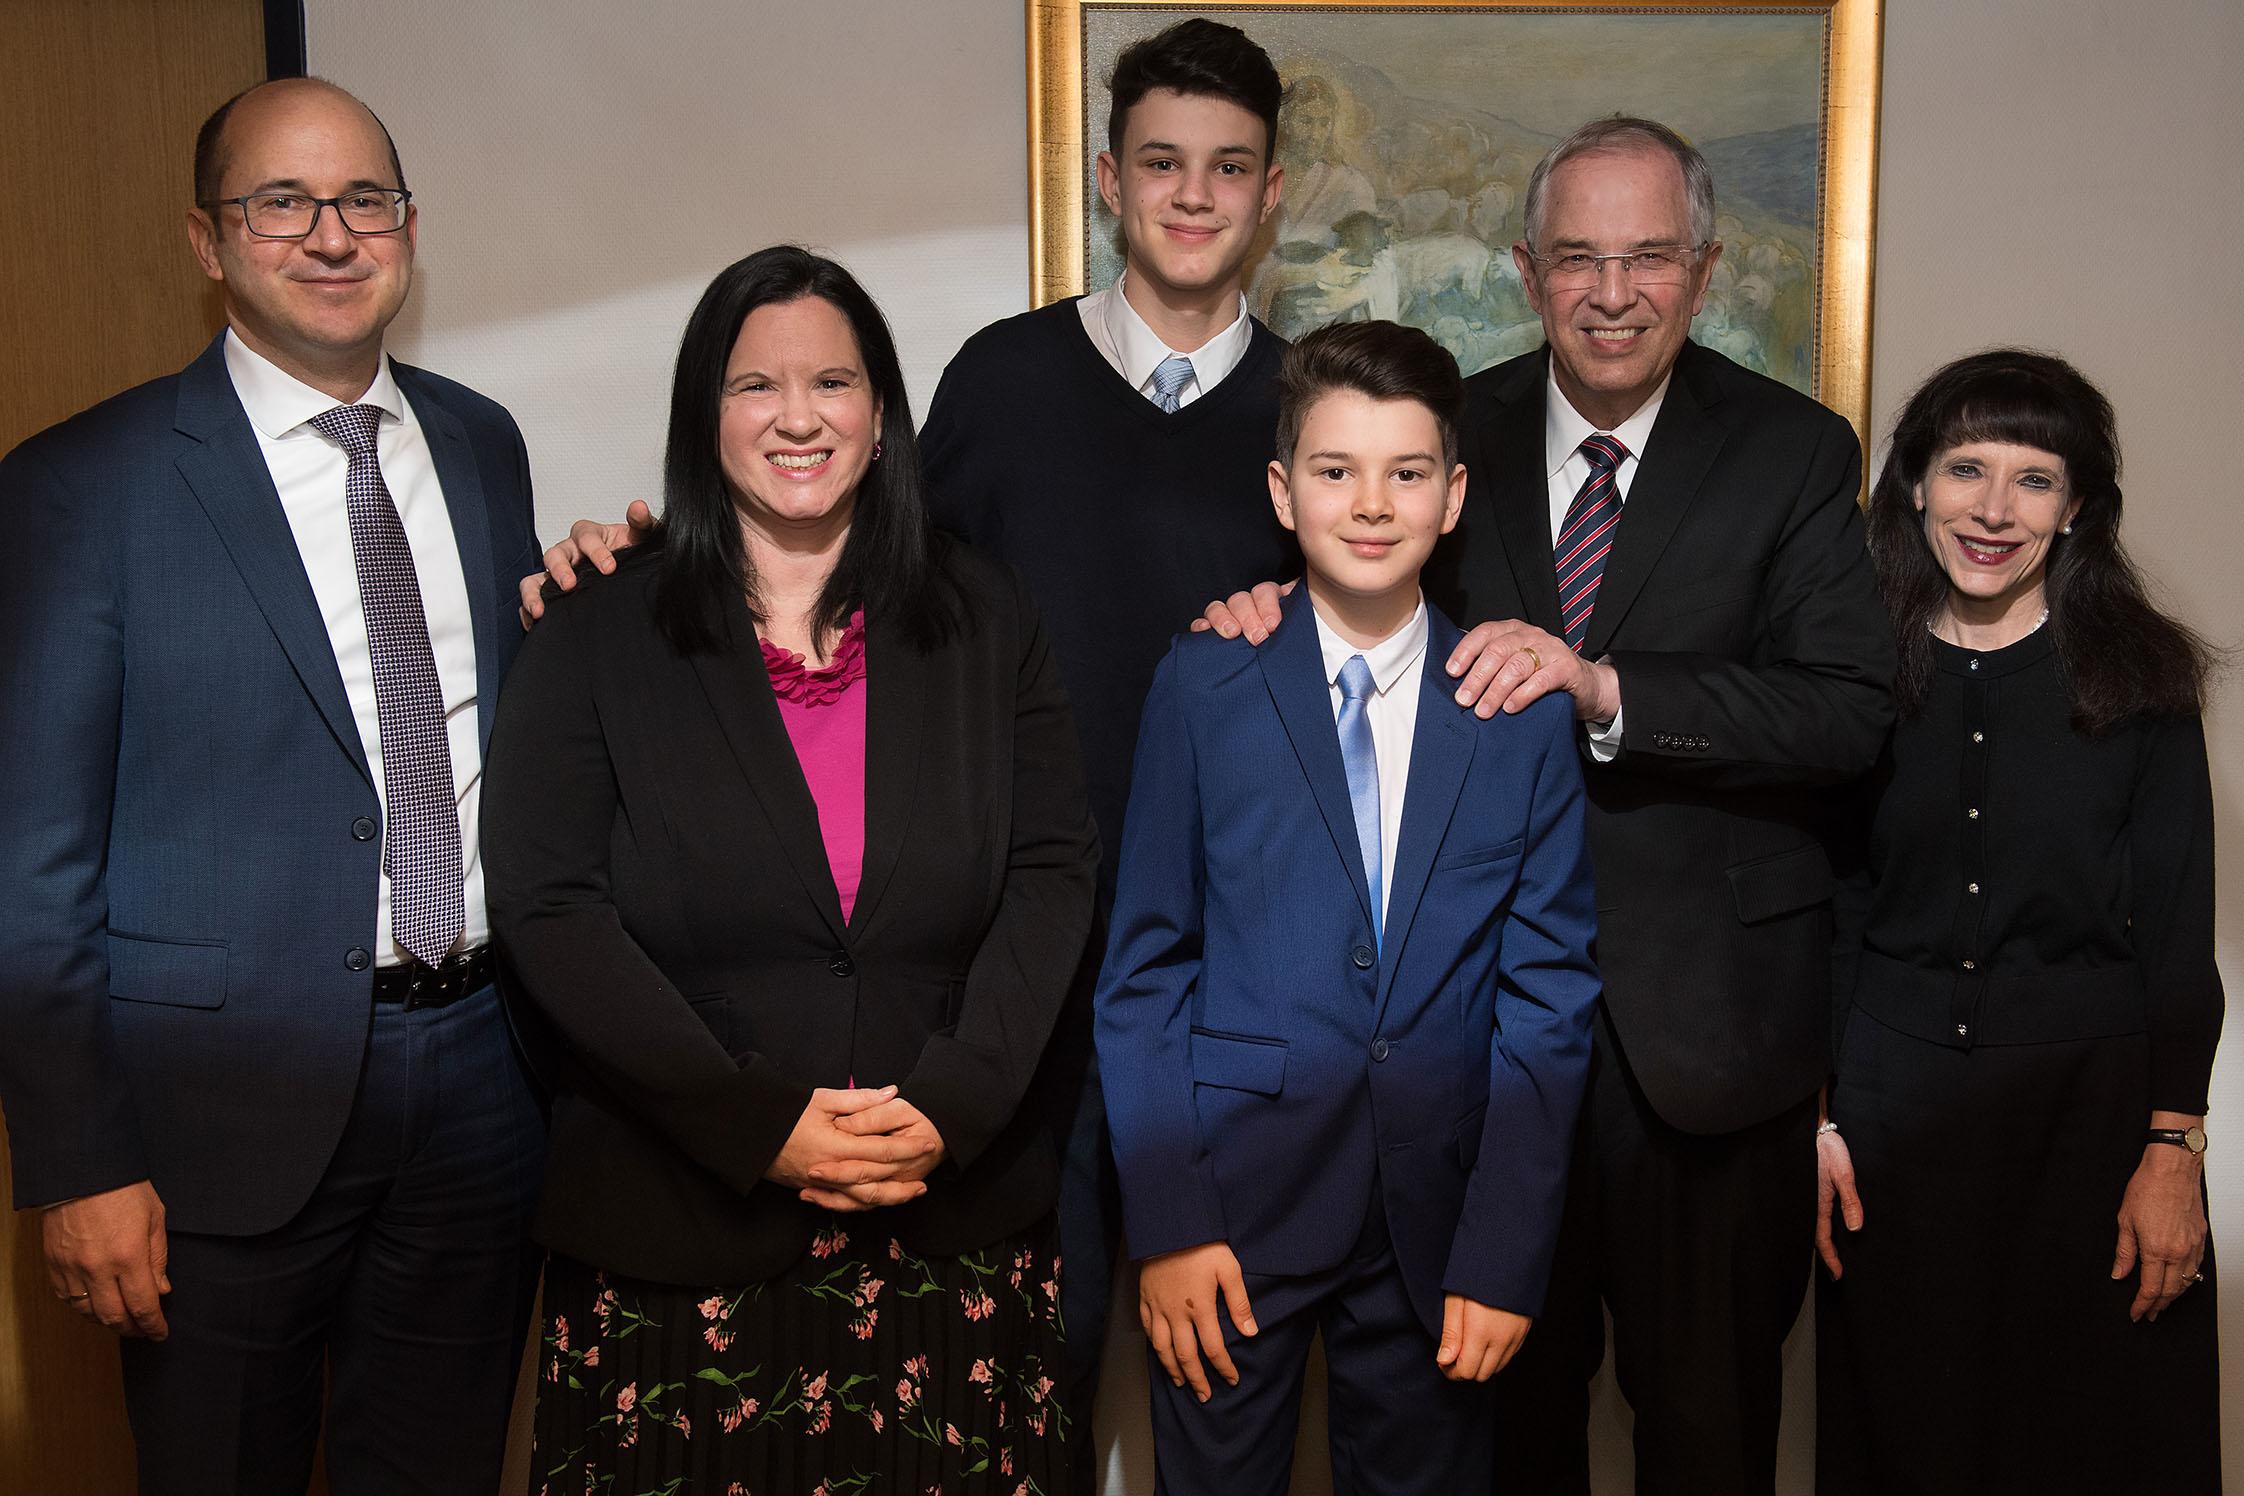 Elder Neil L. Andersen and Sister Kathy Andersen with Elder Helmut and Sister Julia Wondra and their sons, Samuel and Benjamin.